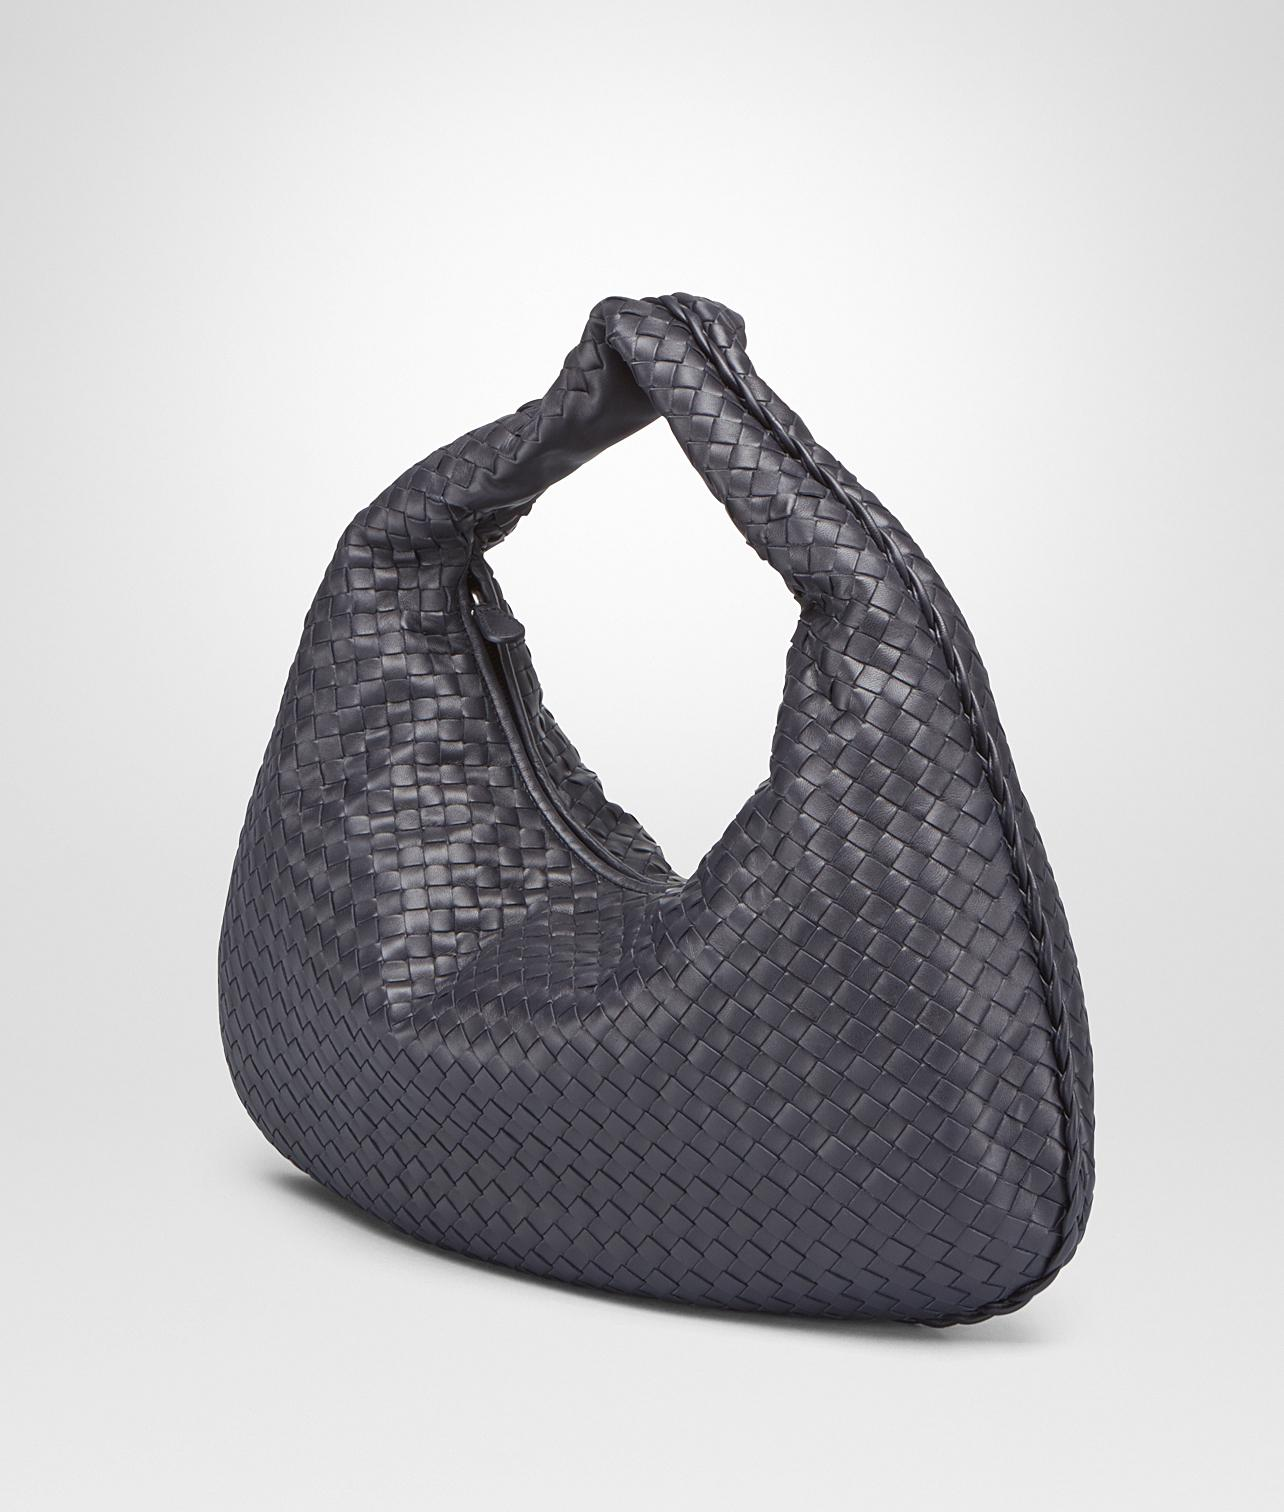 d3d07de4cb2c Lyst - Bottega Veneta Light Gray Intrecciato Nappa Large Veneta Bag